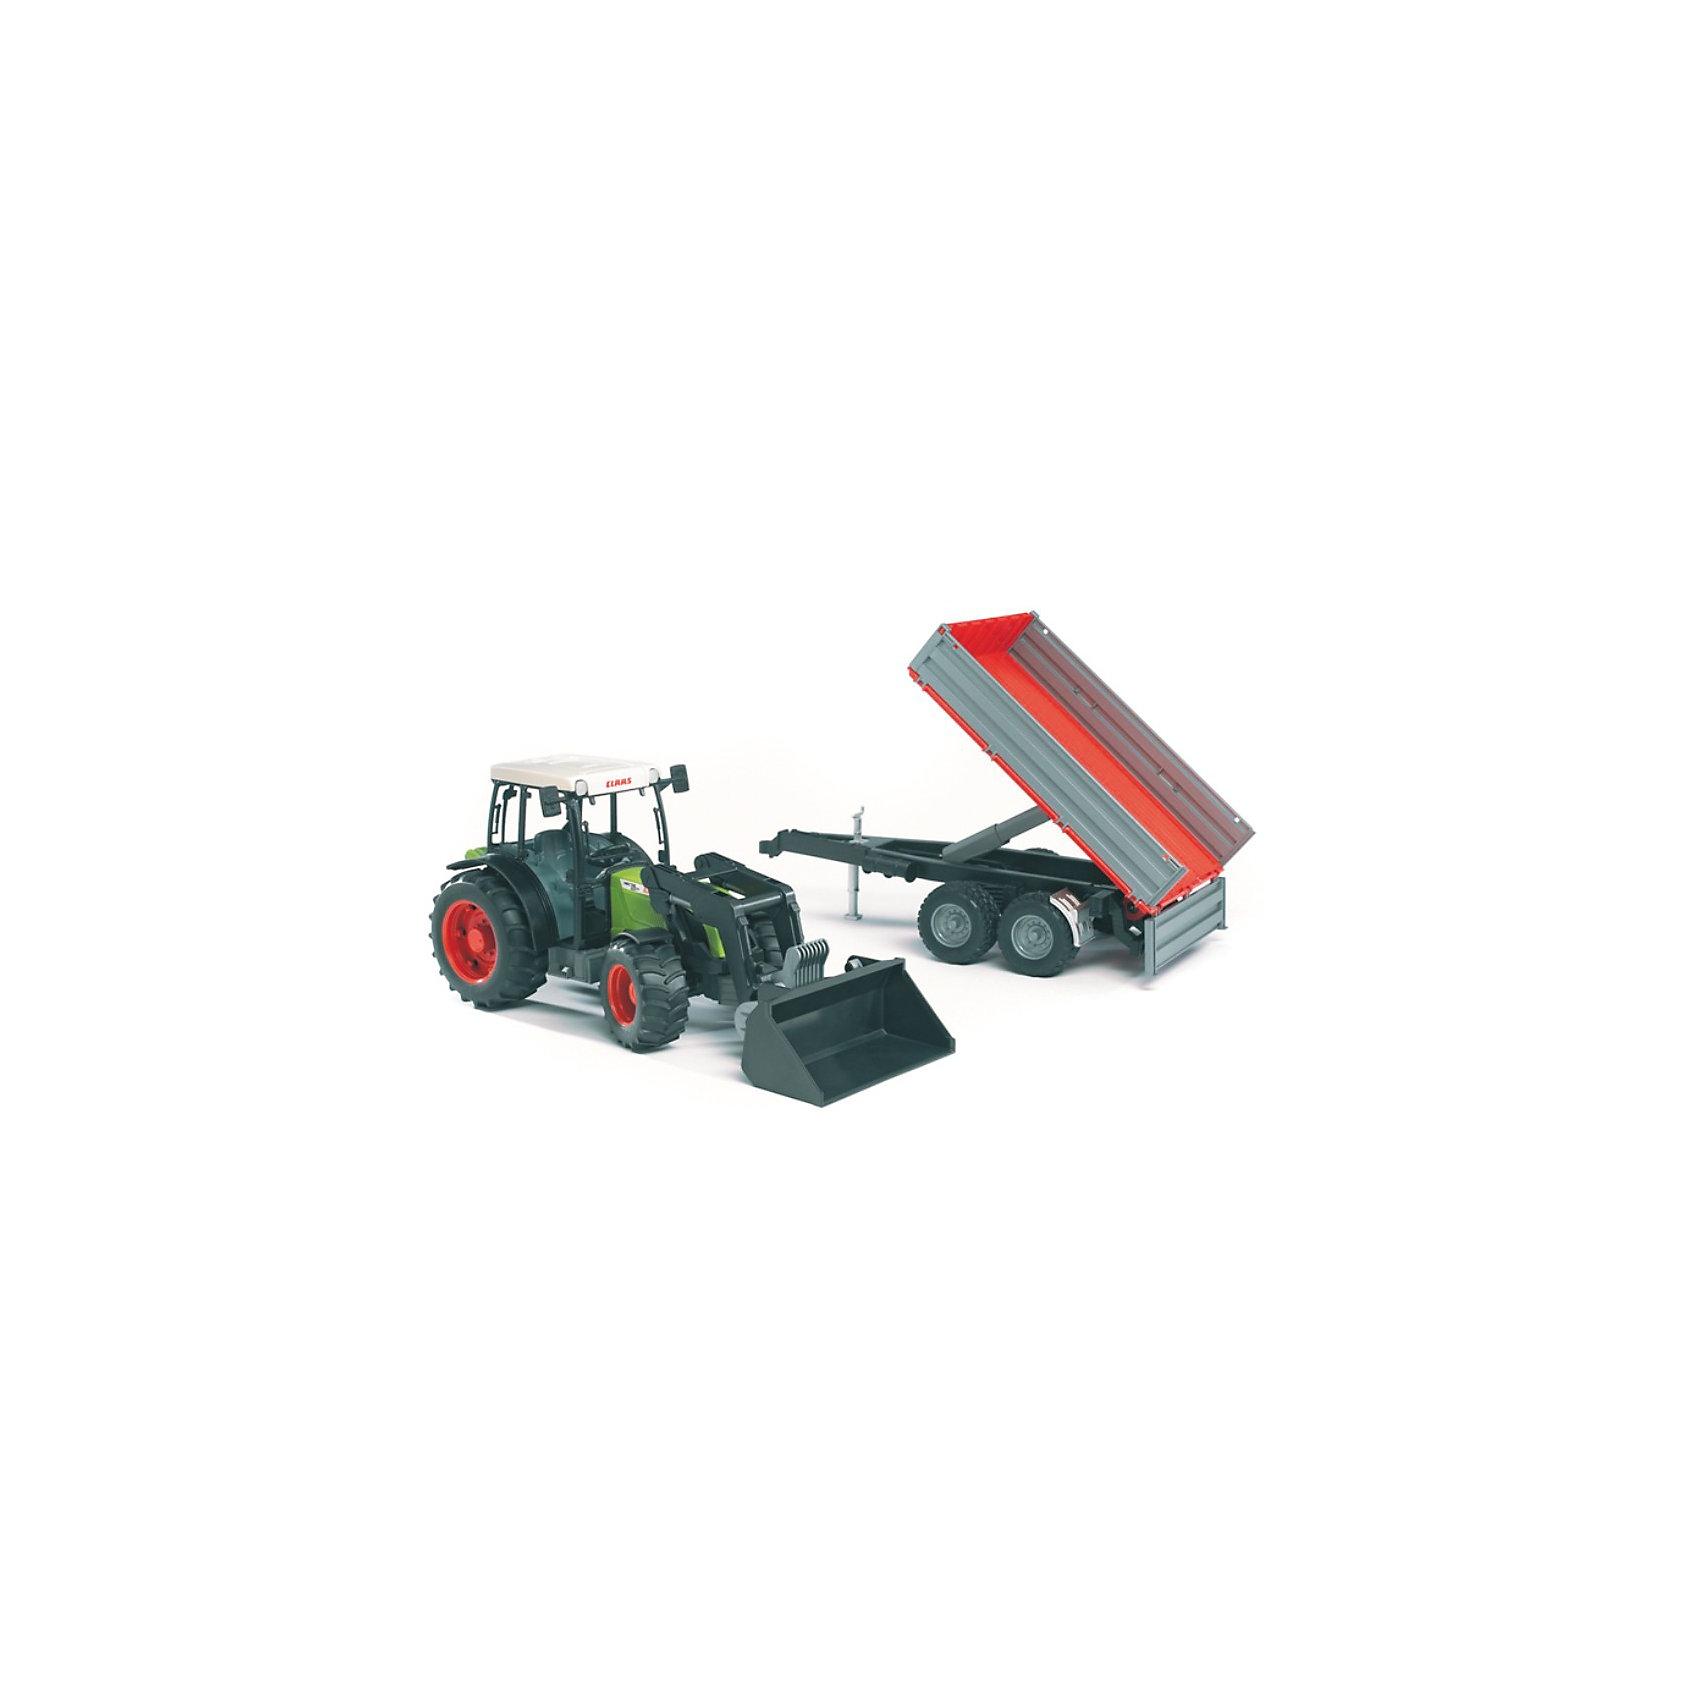 Bruder Трактор Claas Nectis с погрузчиком и прицепом, Bruder трактор bruder claas axion 950 bruder